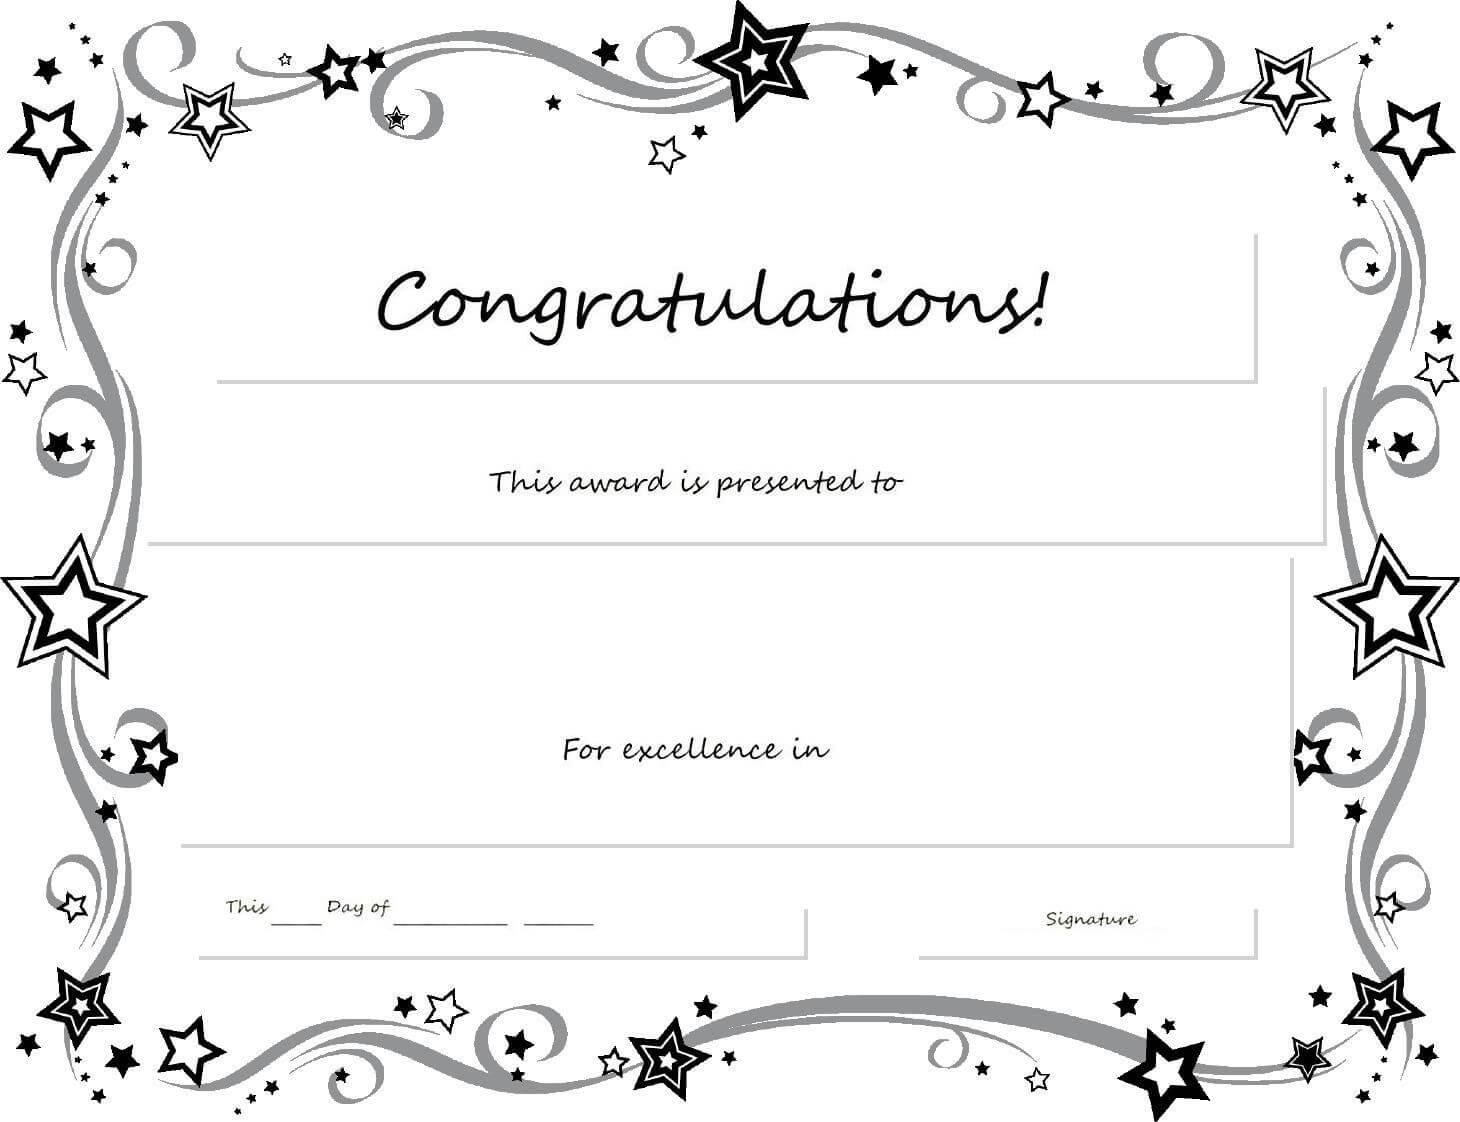 Congratulations Certificate Word Template - Erieairfair With Regarding Congratulations Certificate Word Template